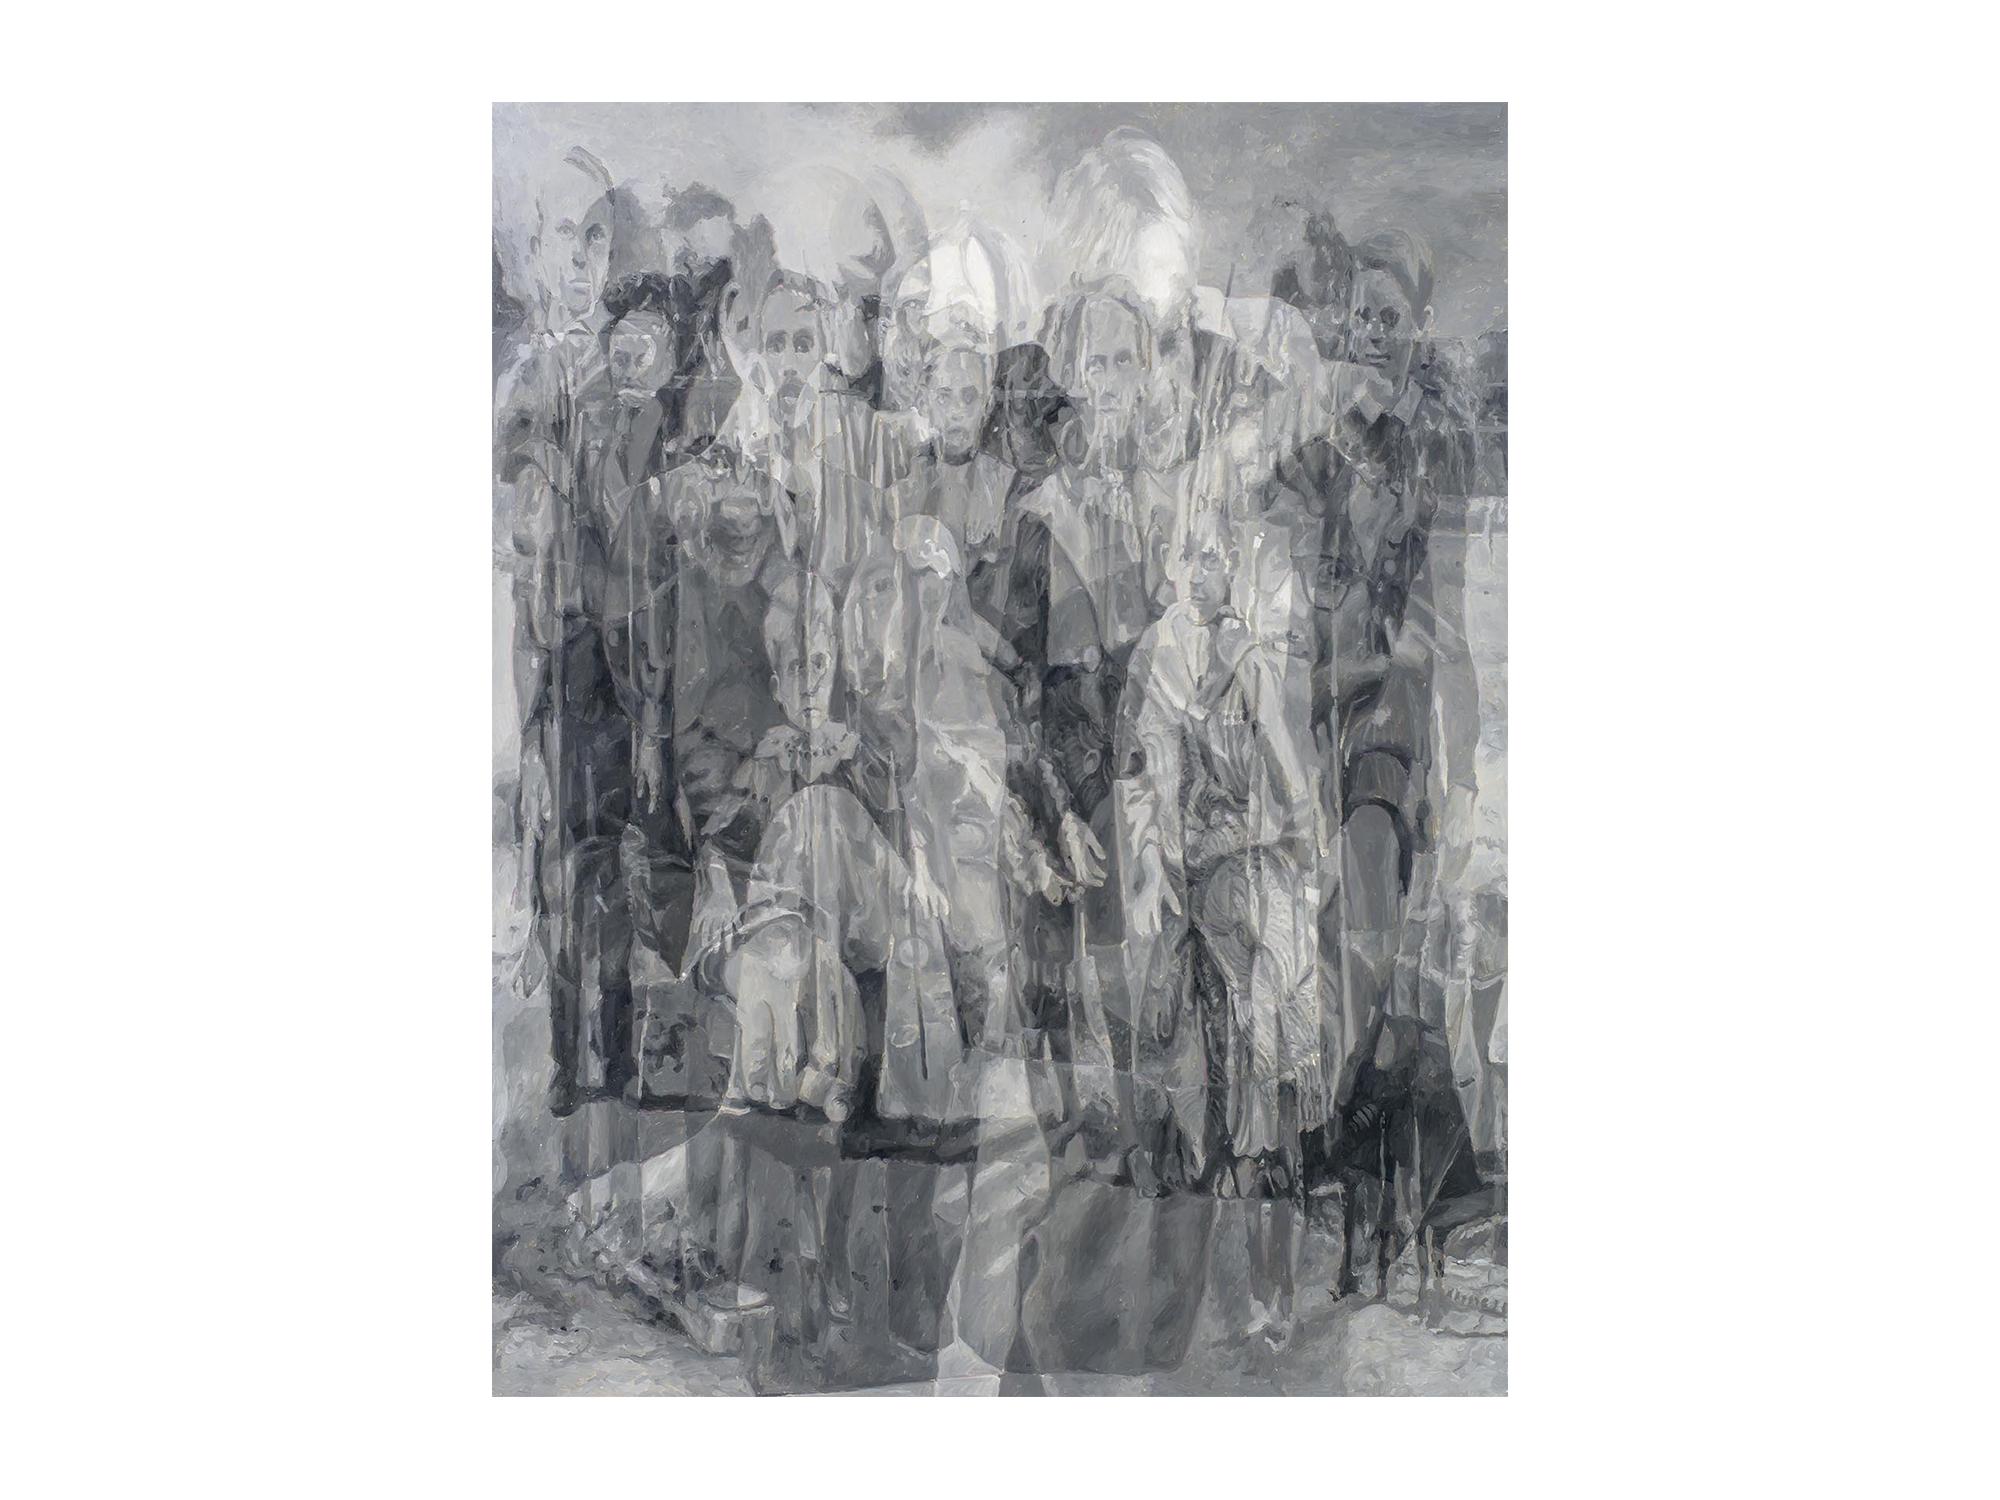 Julie Fragar    Intergenerational (Fraga/Fragar) , 2016 oil on board 92 x 72cm   ARTIST BIO